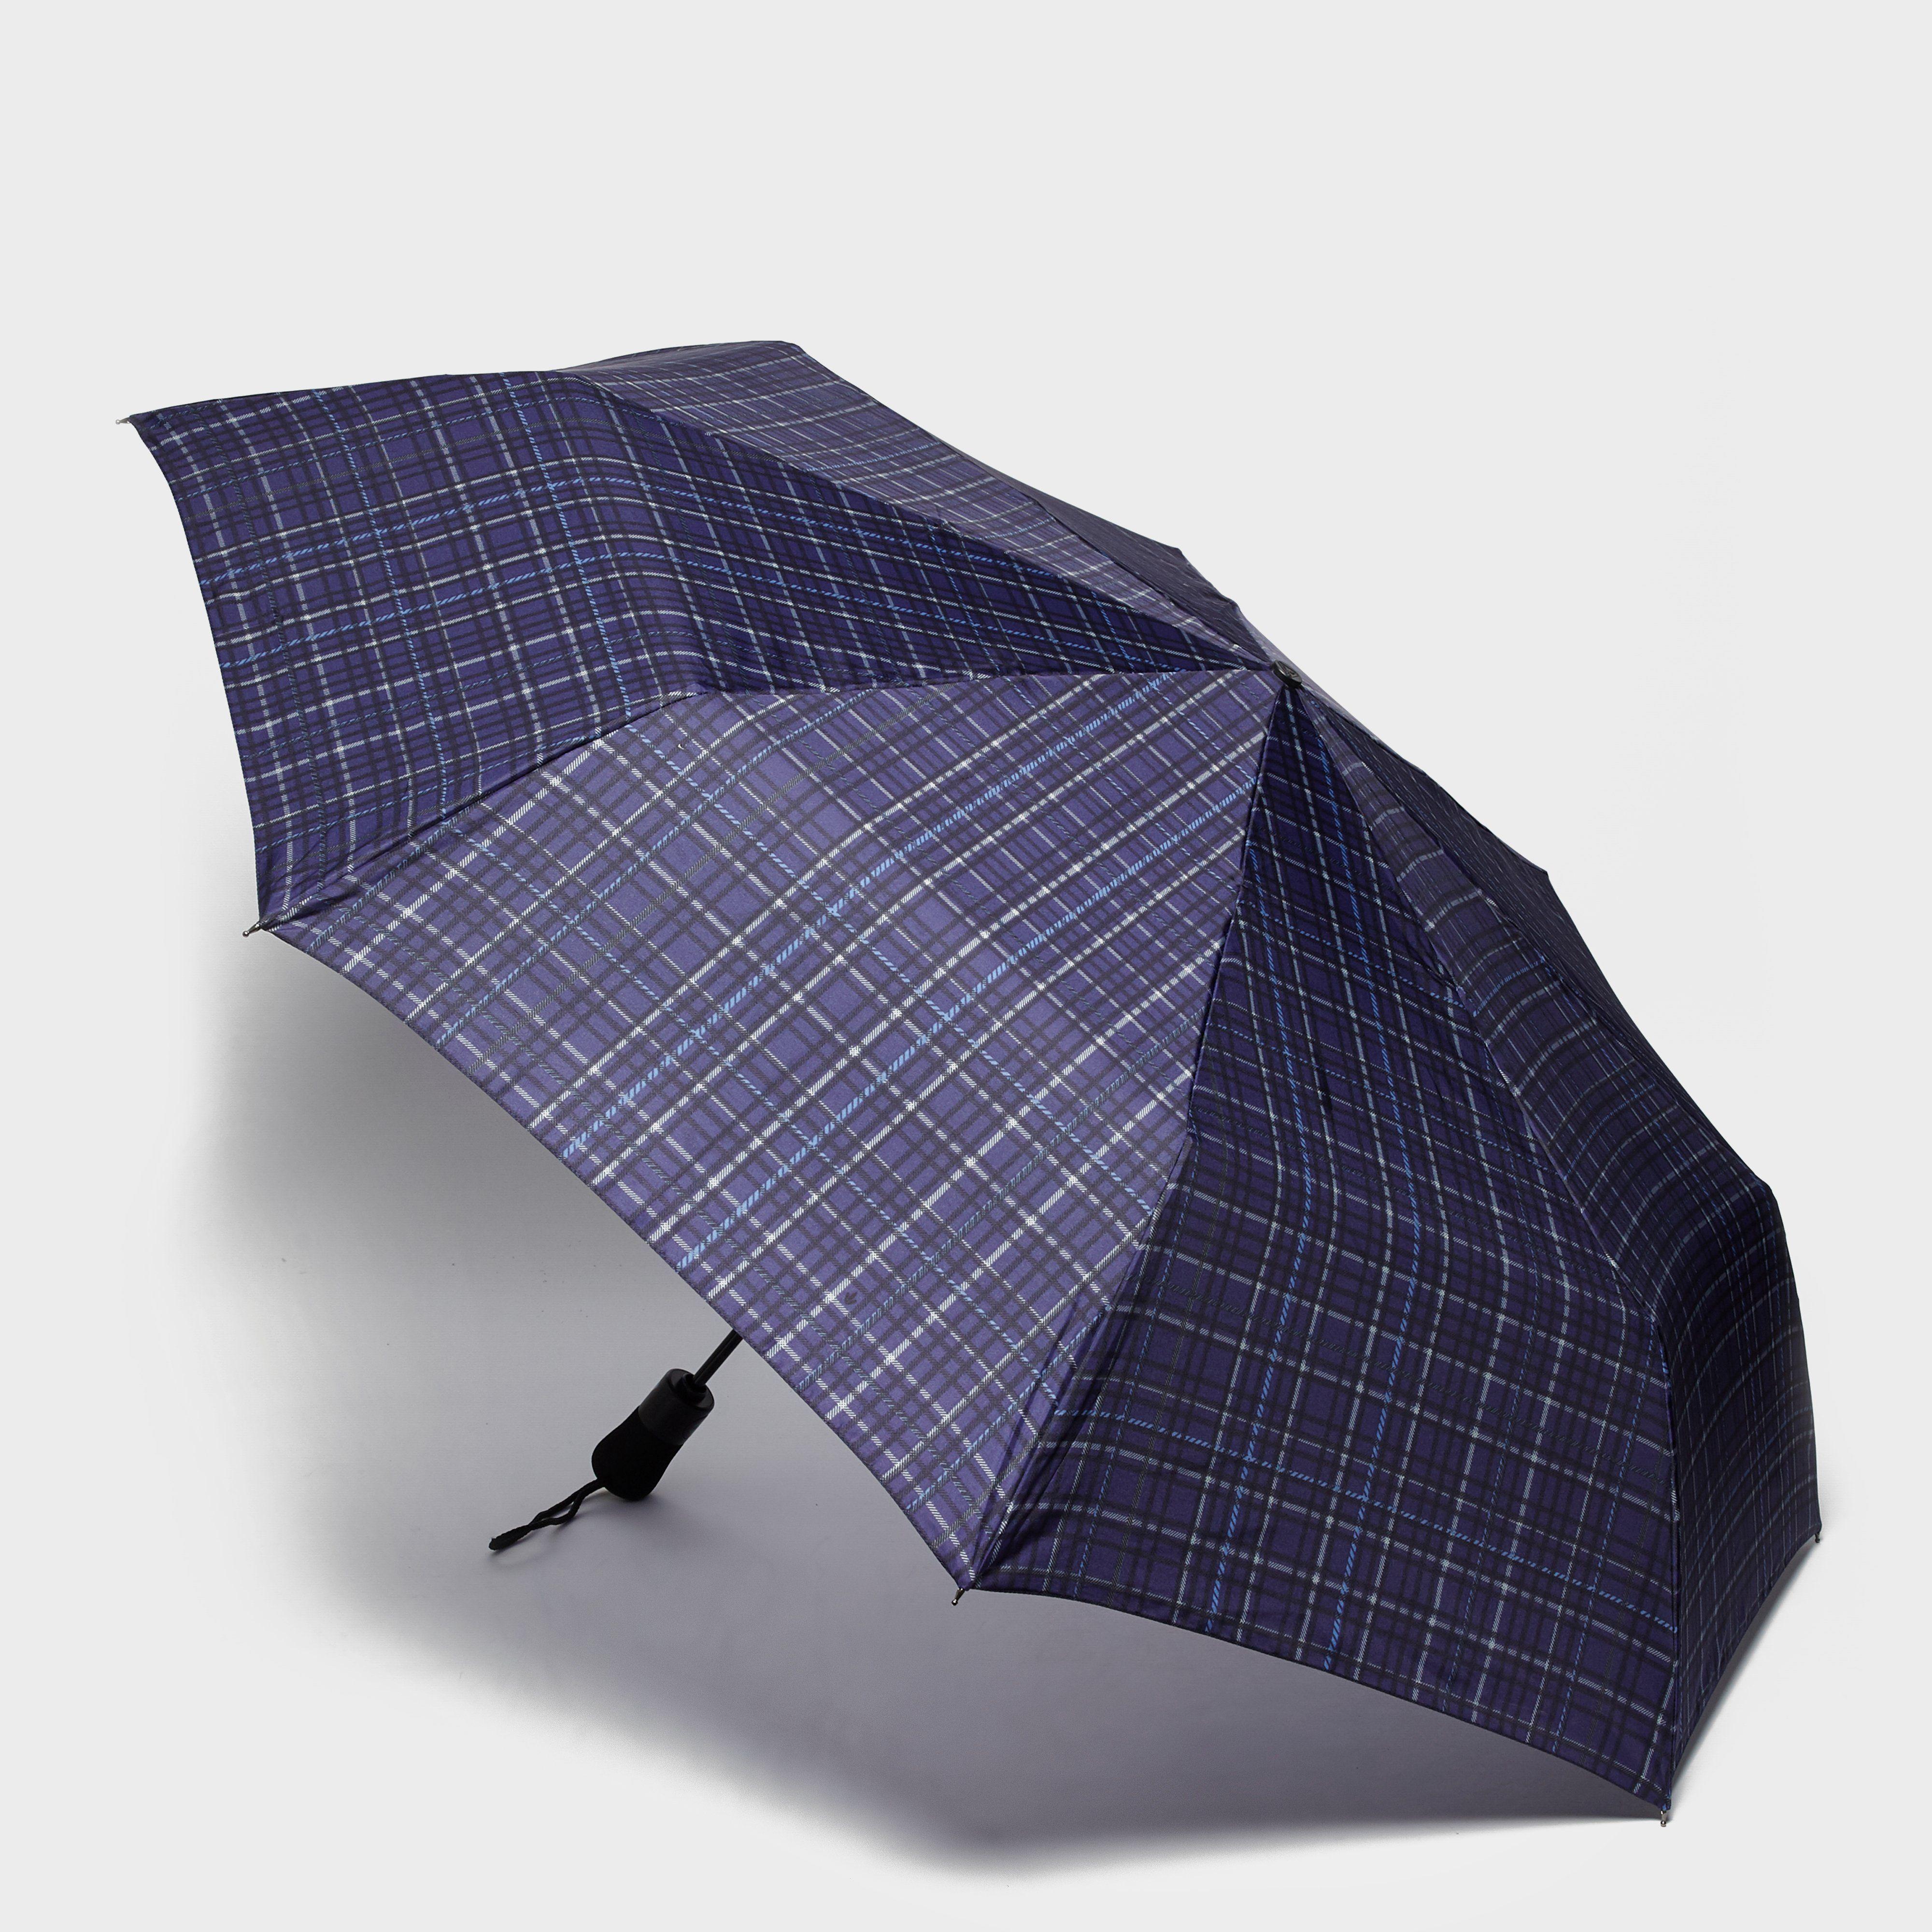 FULTON Open Close Jumbo 2 Umbrella